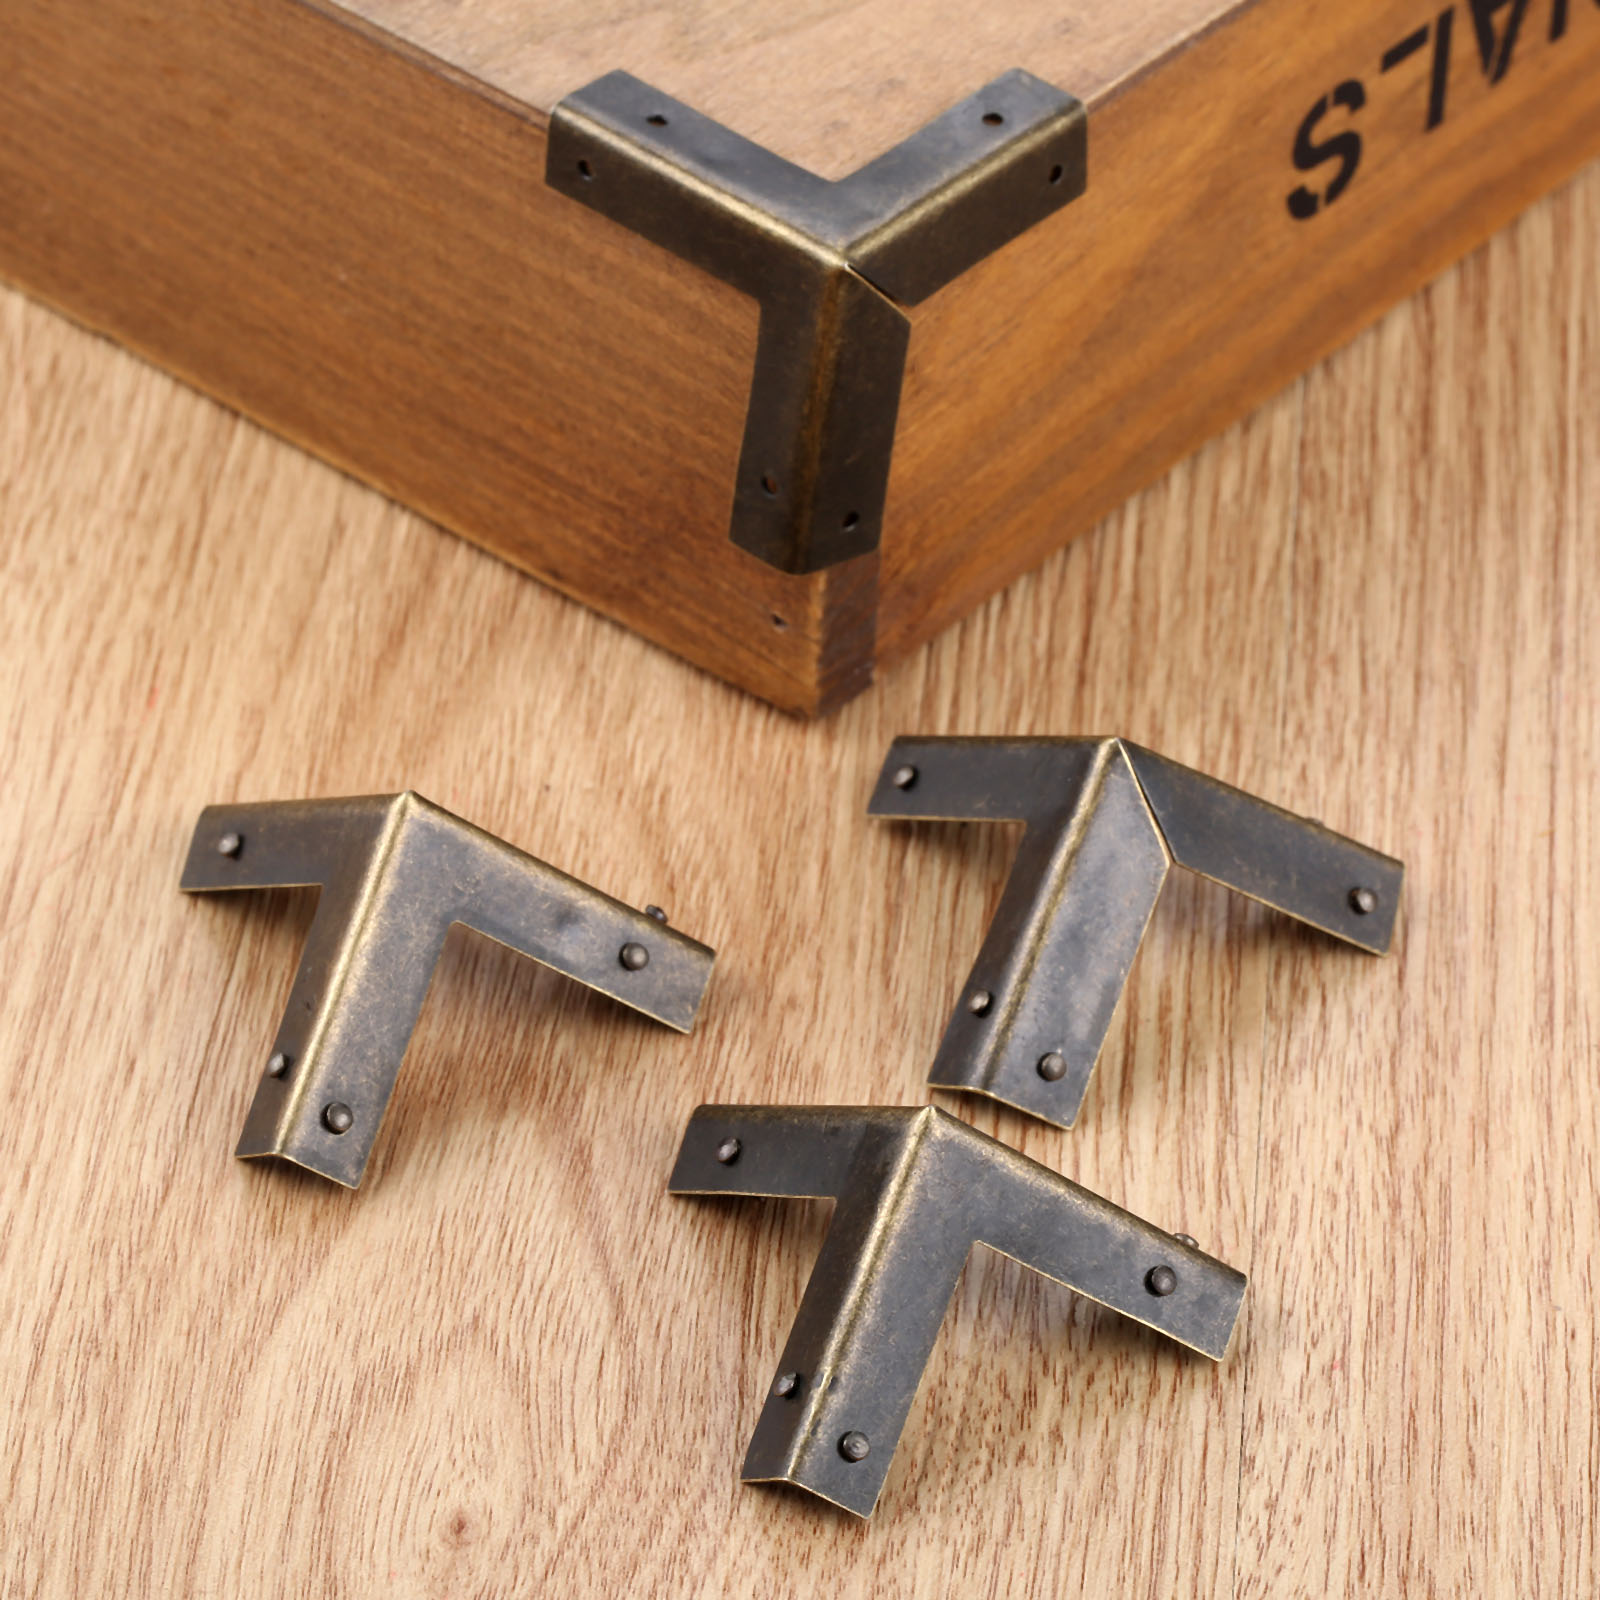 4pcs Silver Furniture Feet Wood Box Zinc Alloy Corner Protectors Kit With Screws